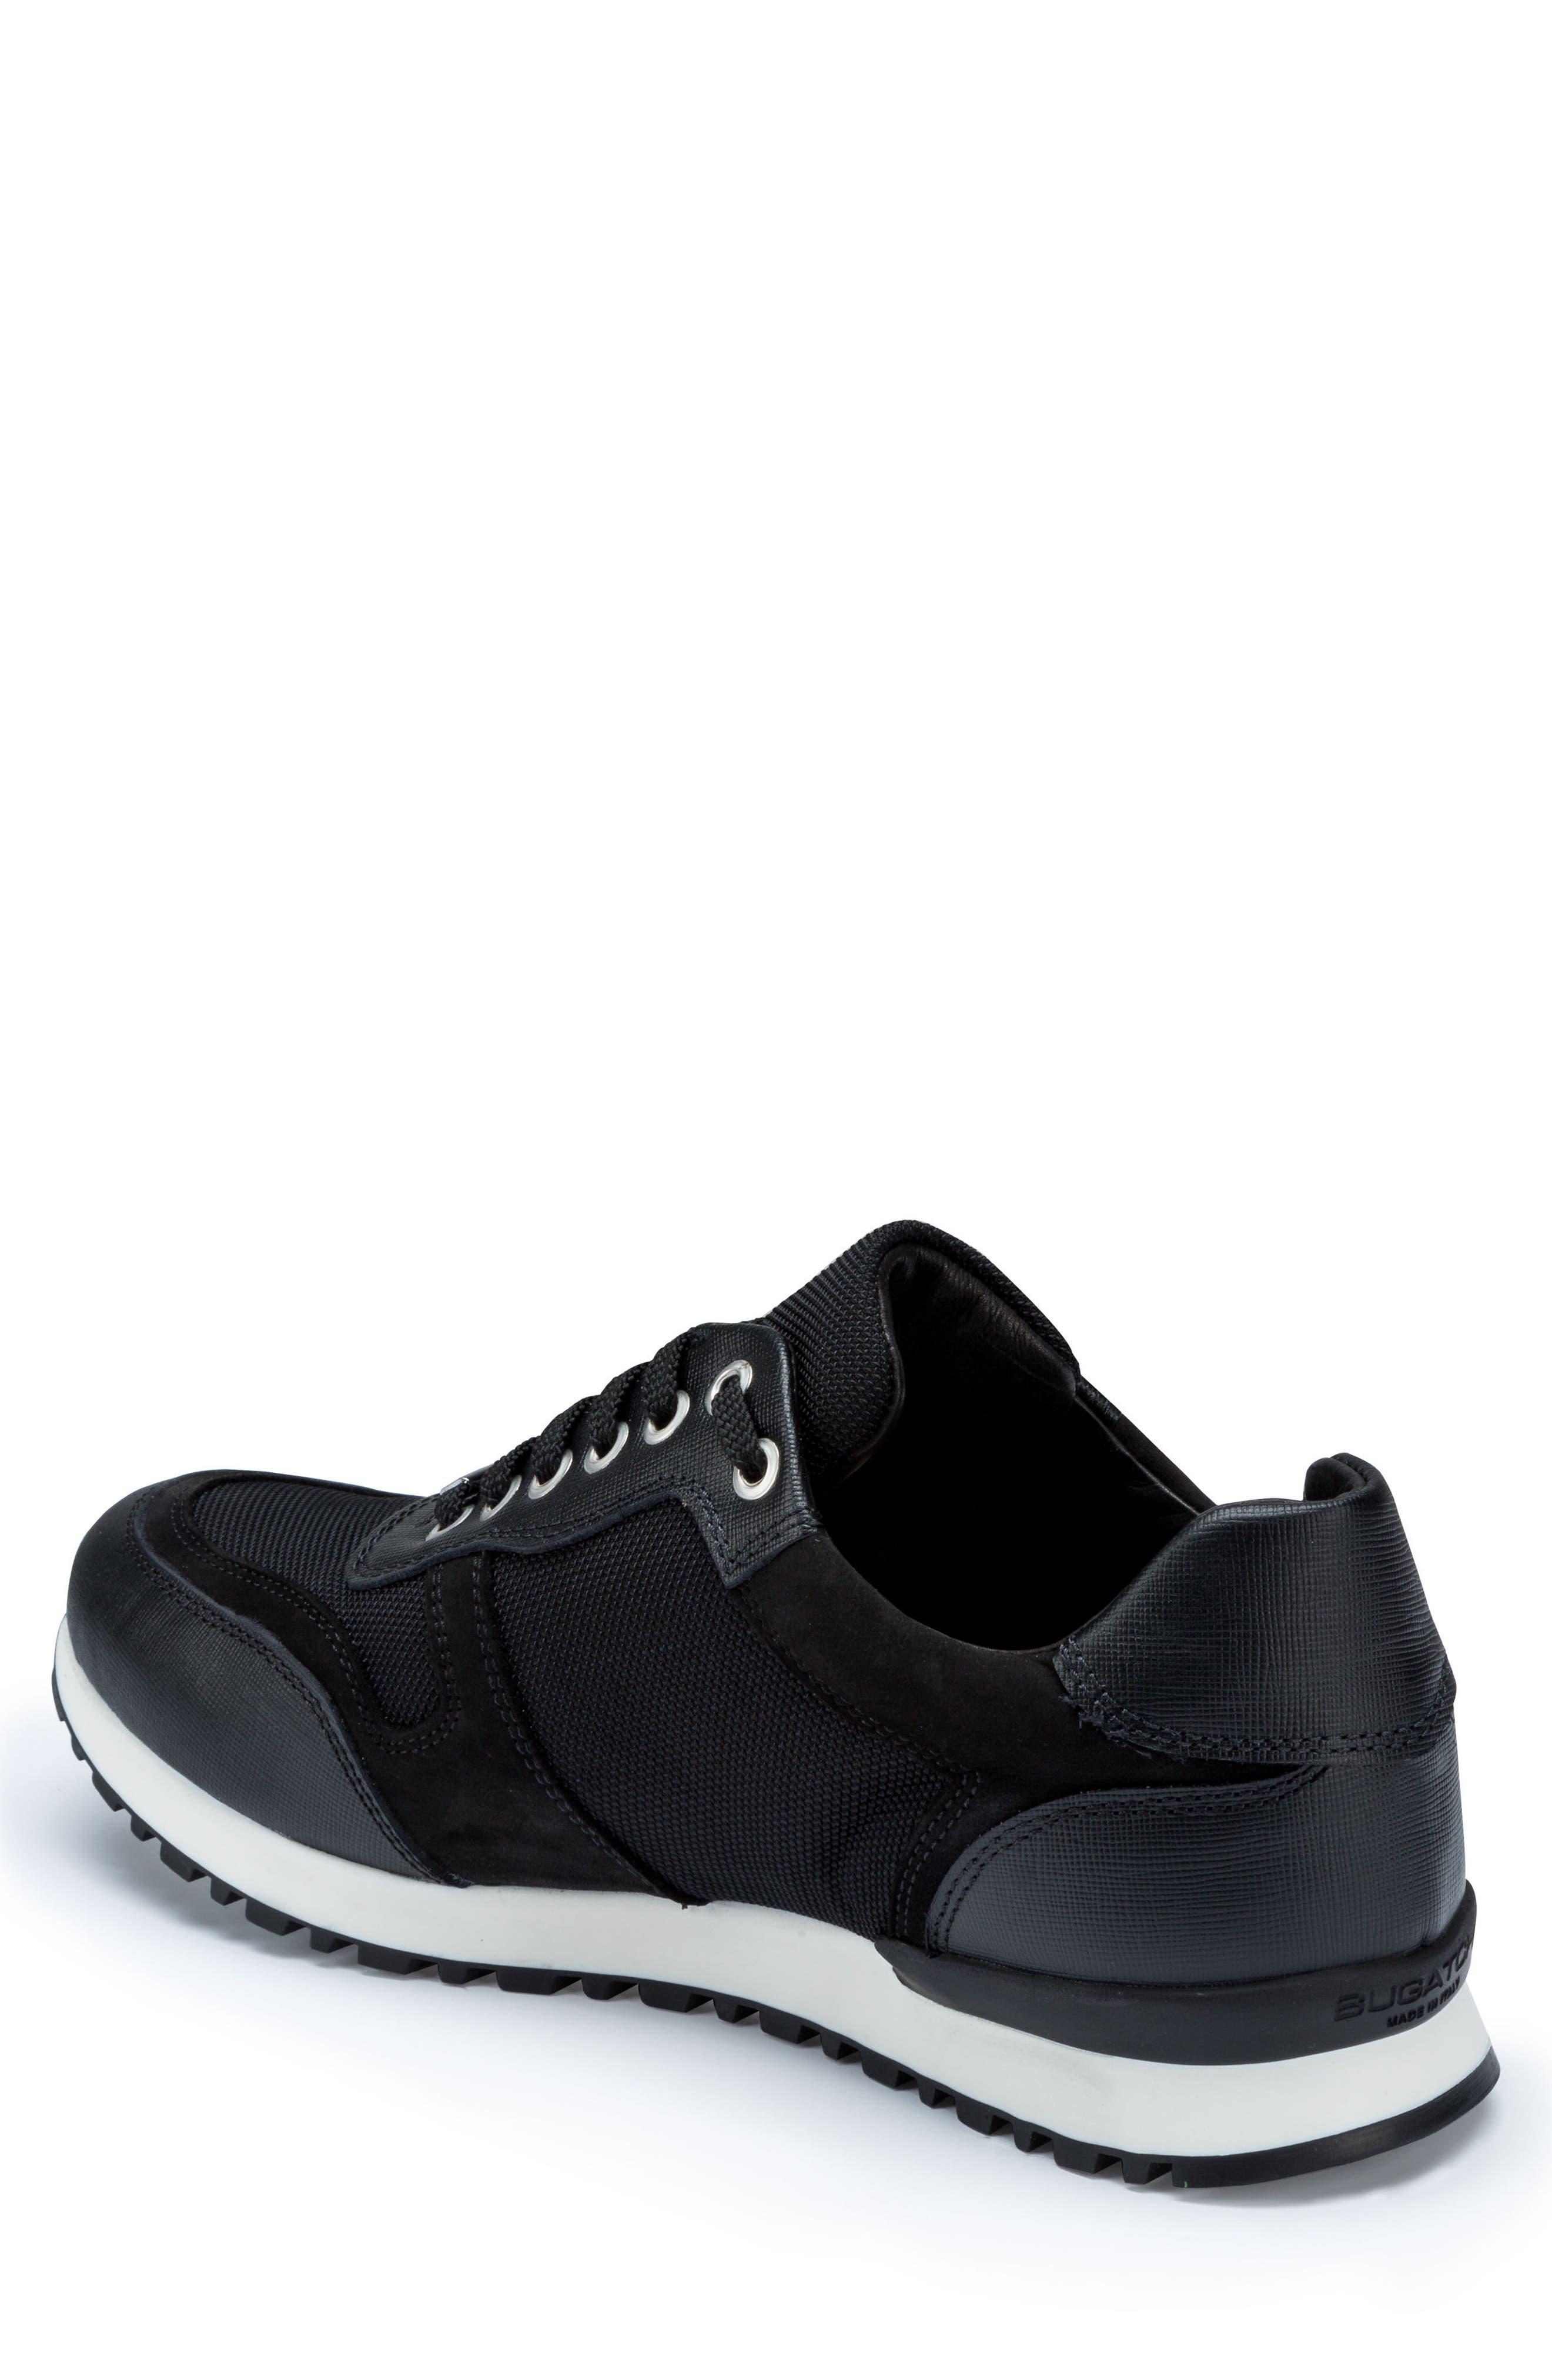 Modena Sneaker,                             Alternate thumbnail 2, color,                             001